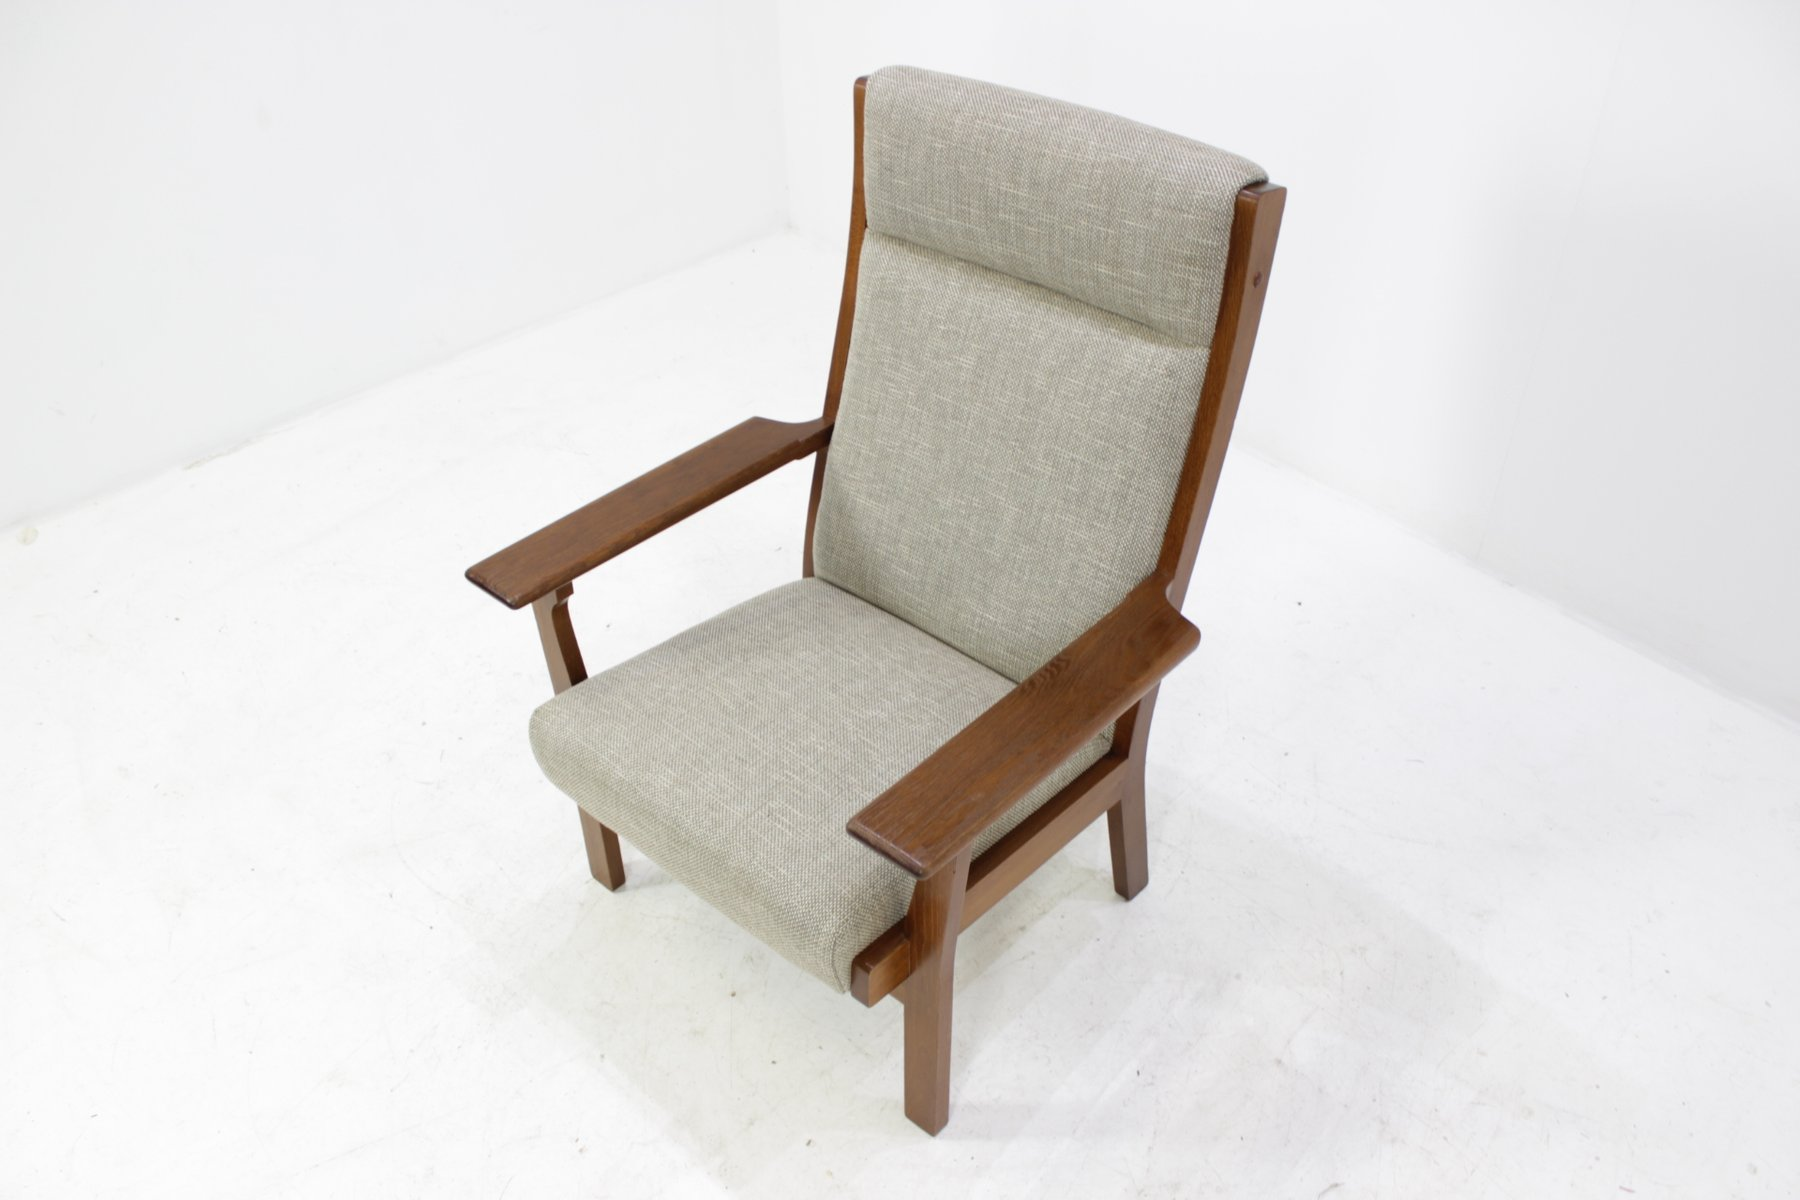 vintage ge181a sessel mit hoher r ckenlehne von hans j. Black Bedroom Furniture Sets. Home Design Ideas